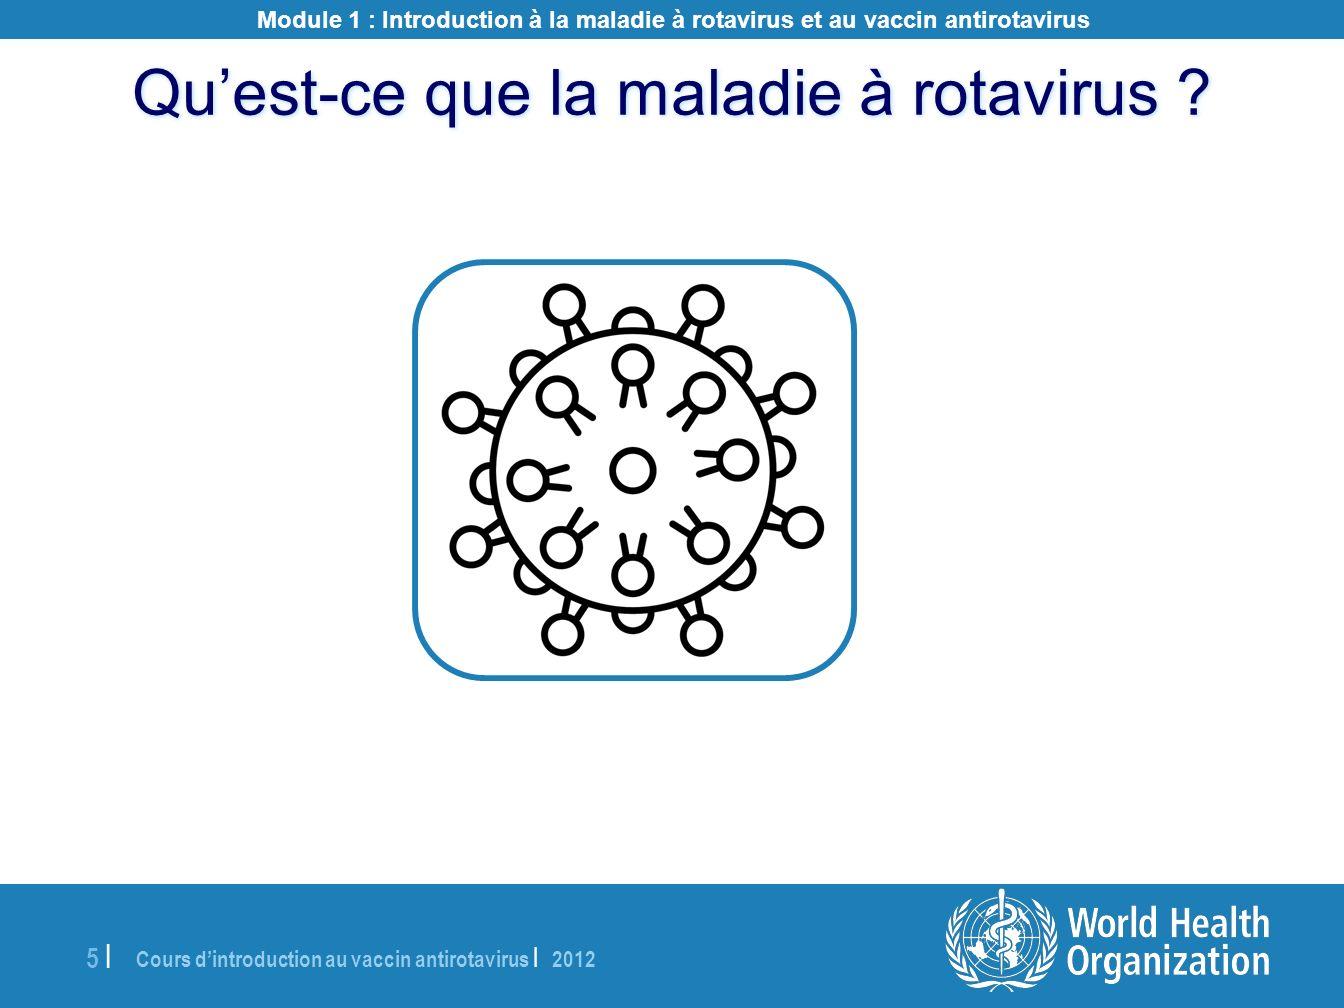 Cours dintroduction au vaccin antirotavirus | 2012 5 |5 | Quest-ce que la maladie à rotavirus ? Module 1 : Introduction à la maladie à rotavirus et au